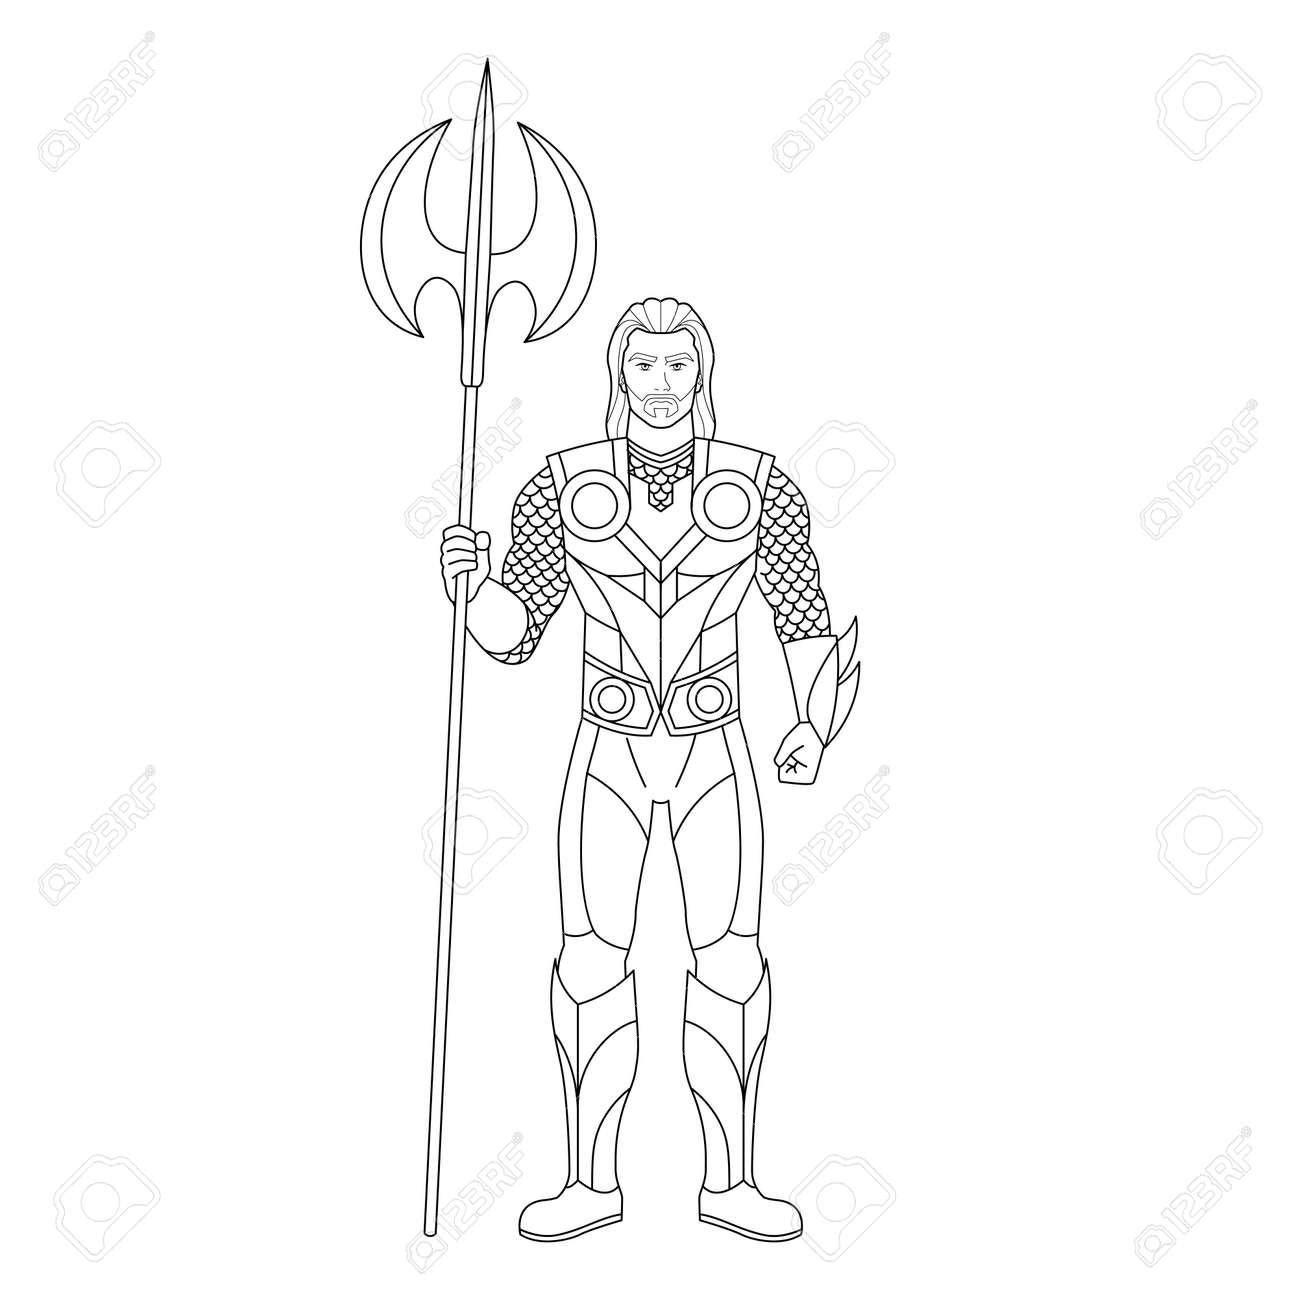 Outline of a superhero cartoon - Vector illustration - 164693171